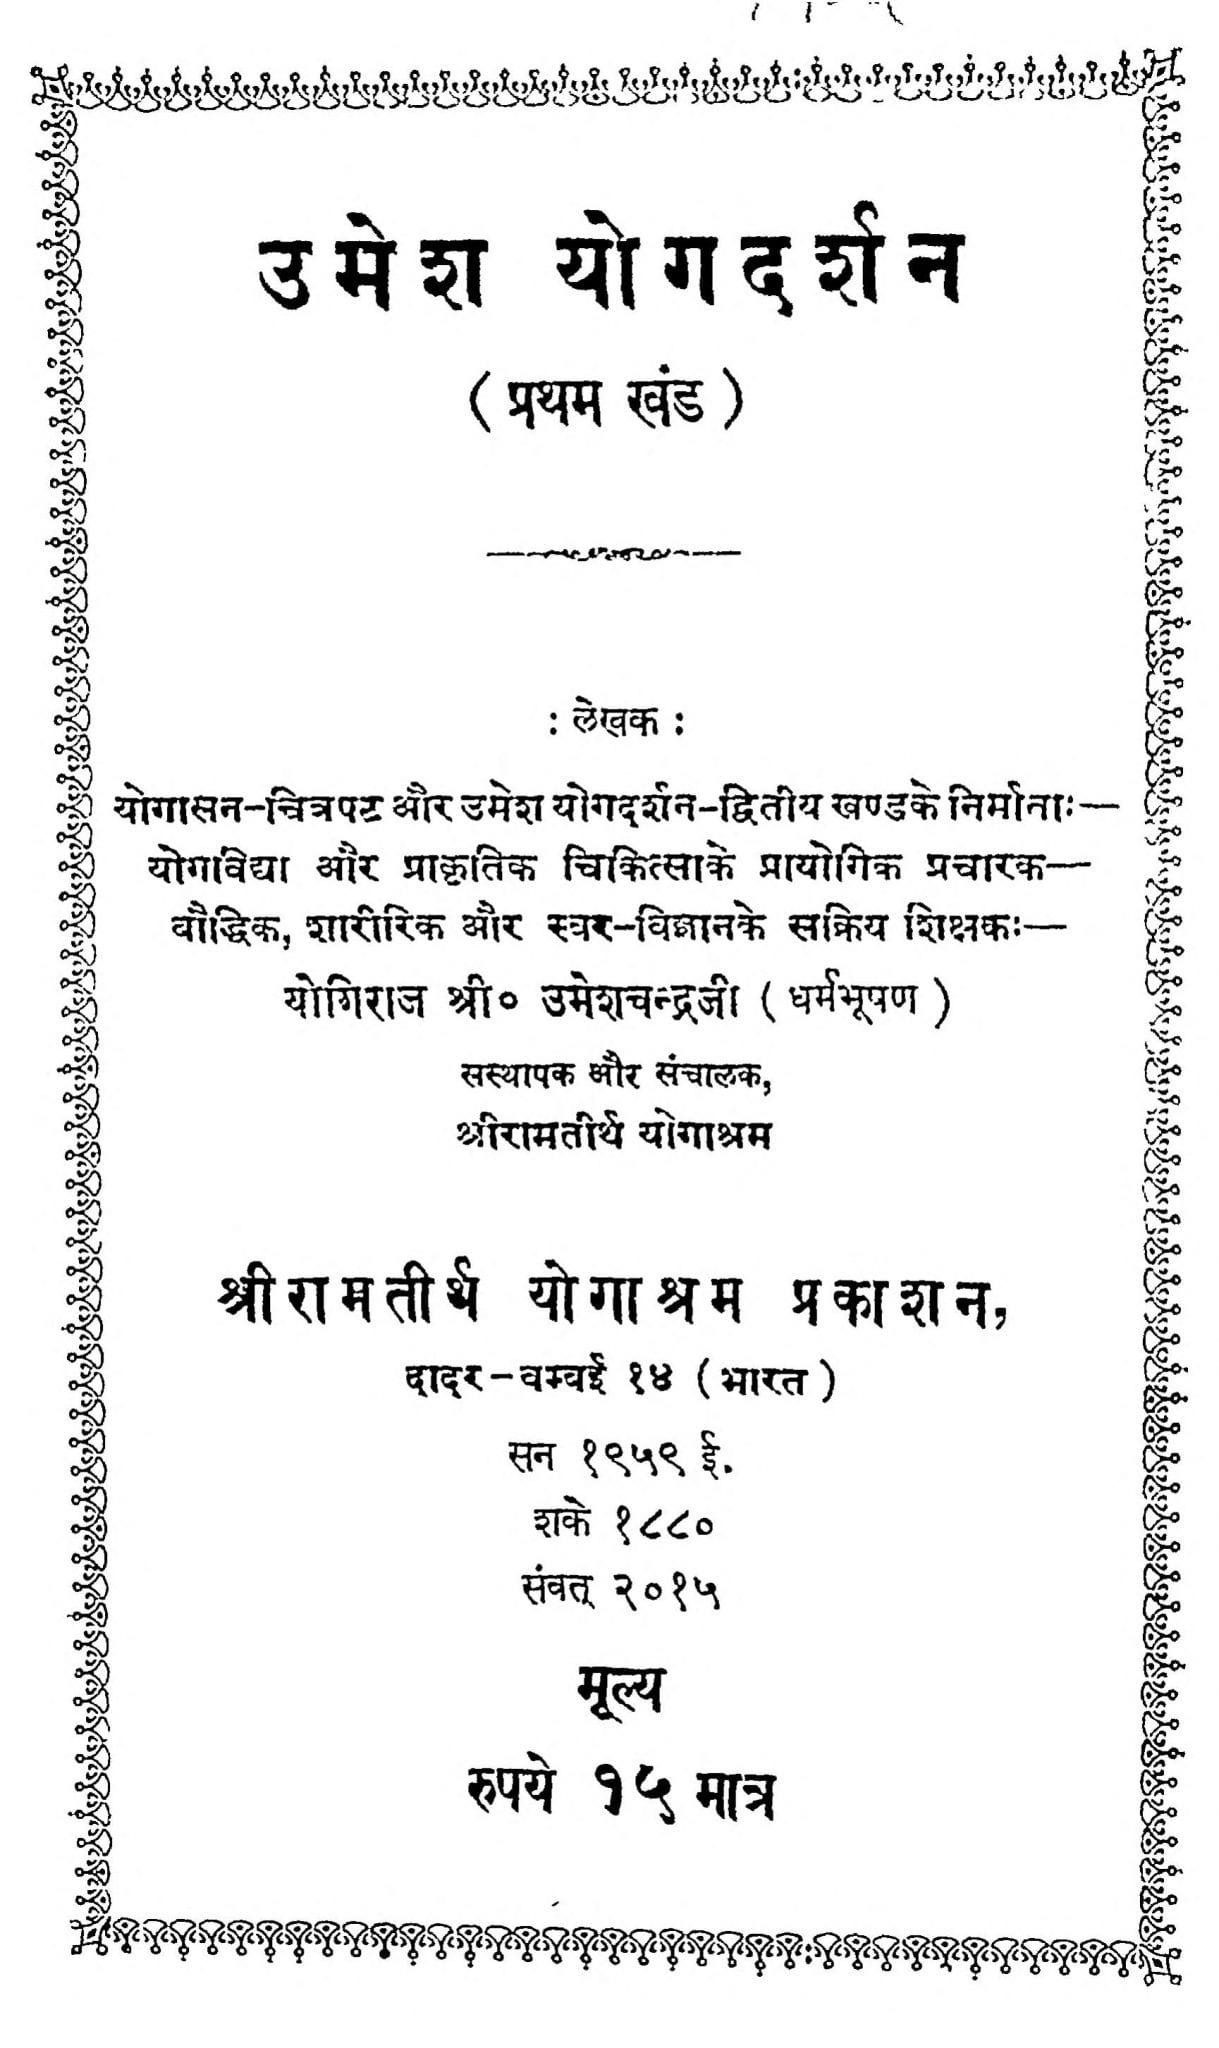 Book Image : उमेश योग दर्शन खंड १  - Umesh Yoga Darshan Part-i